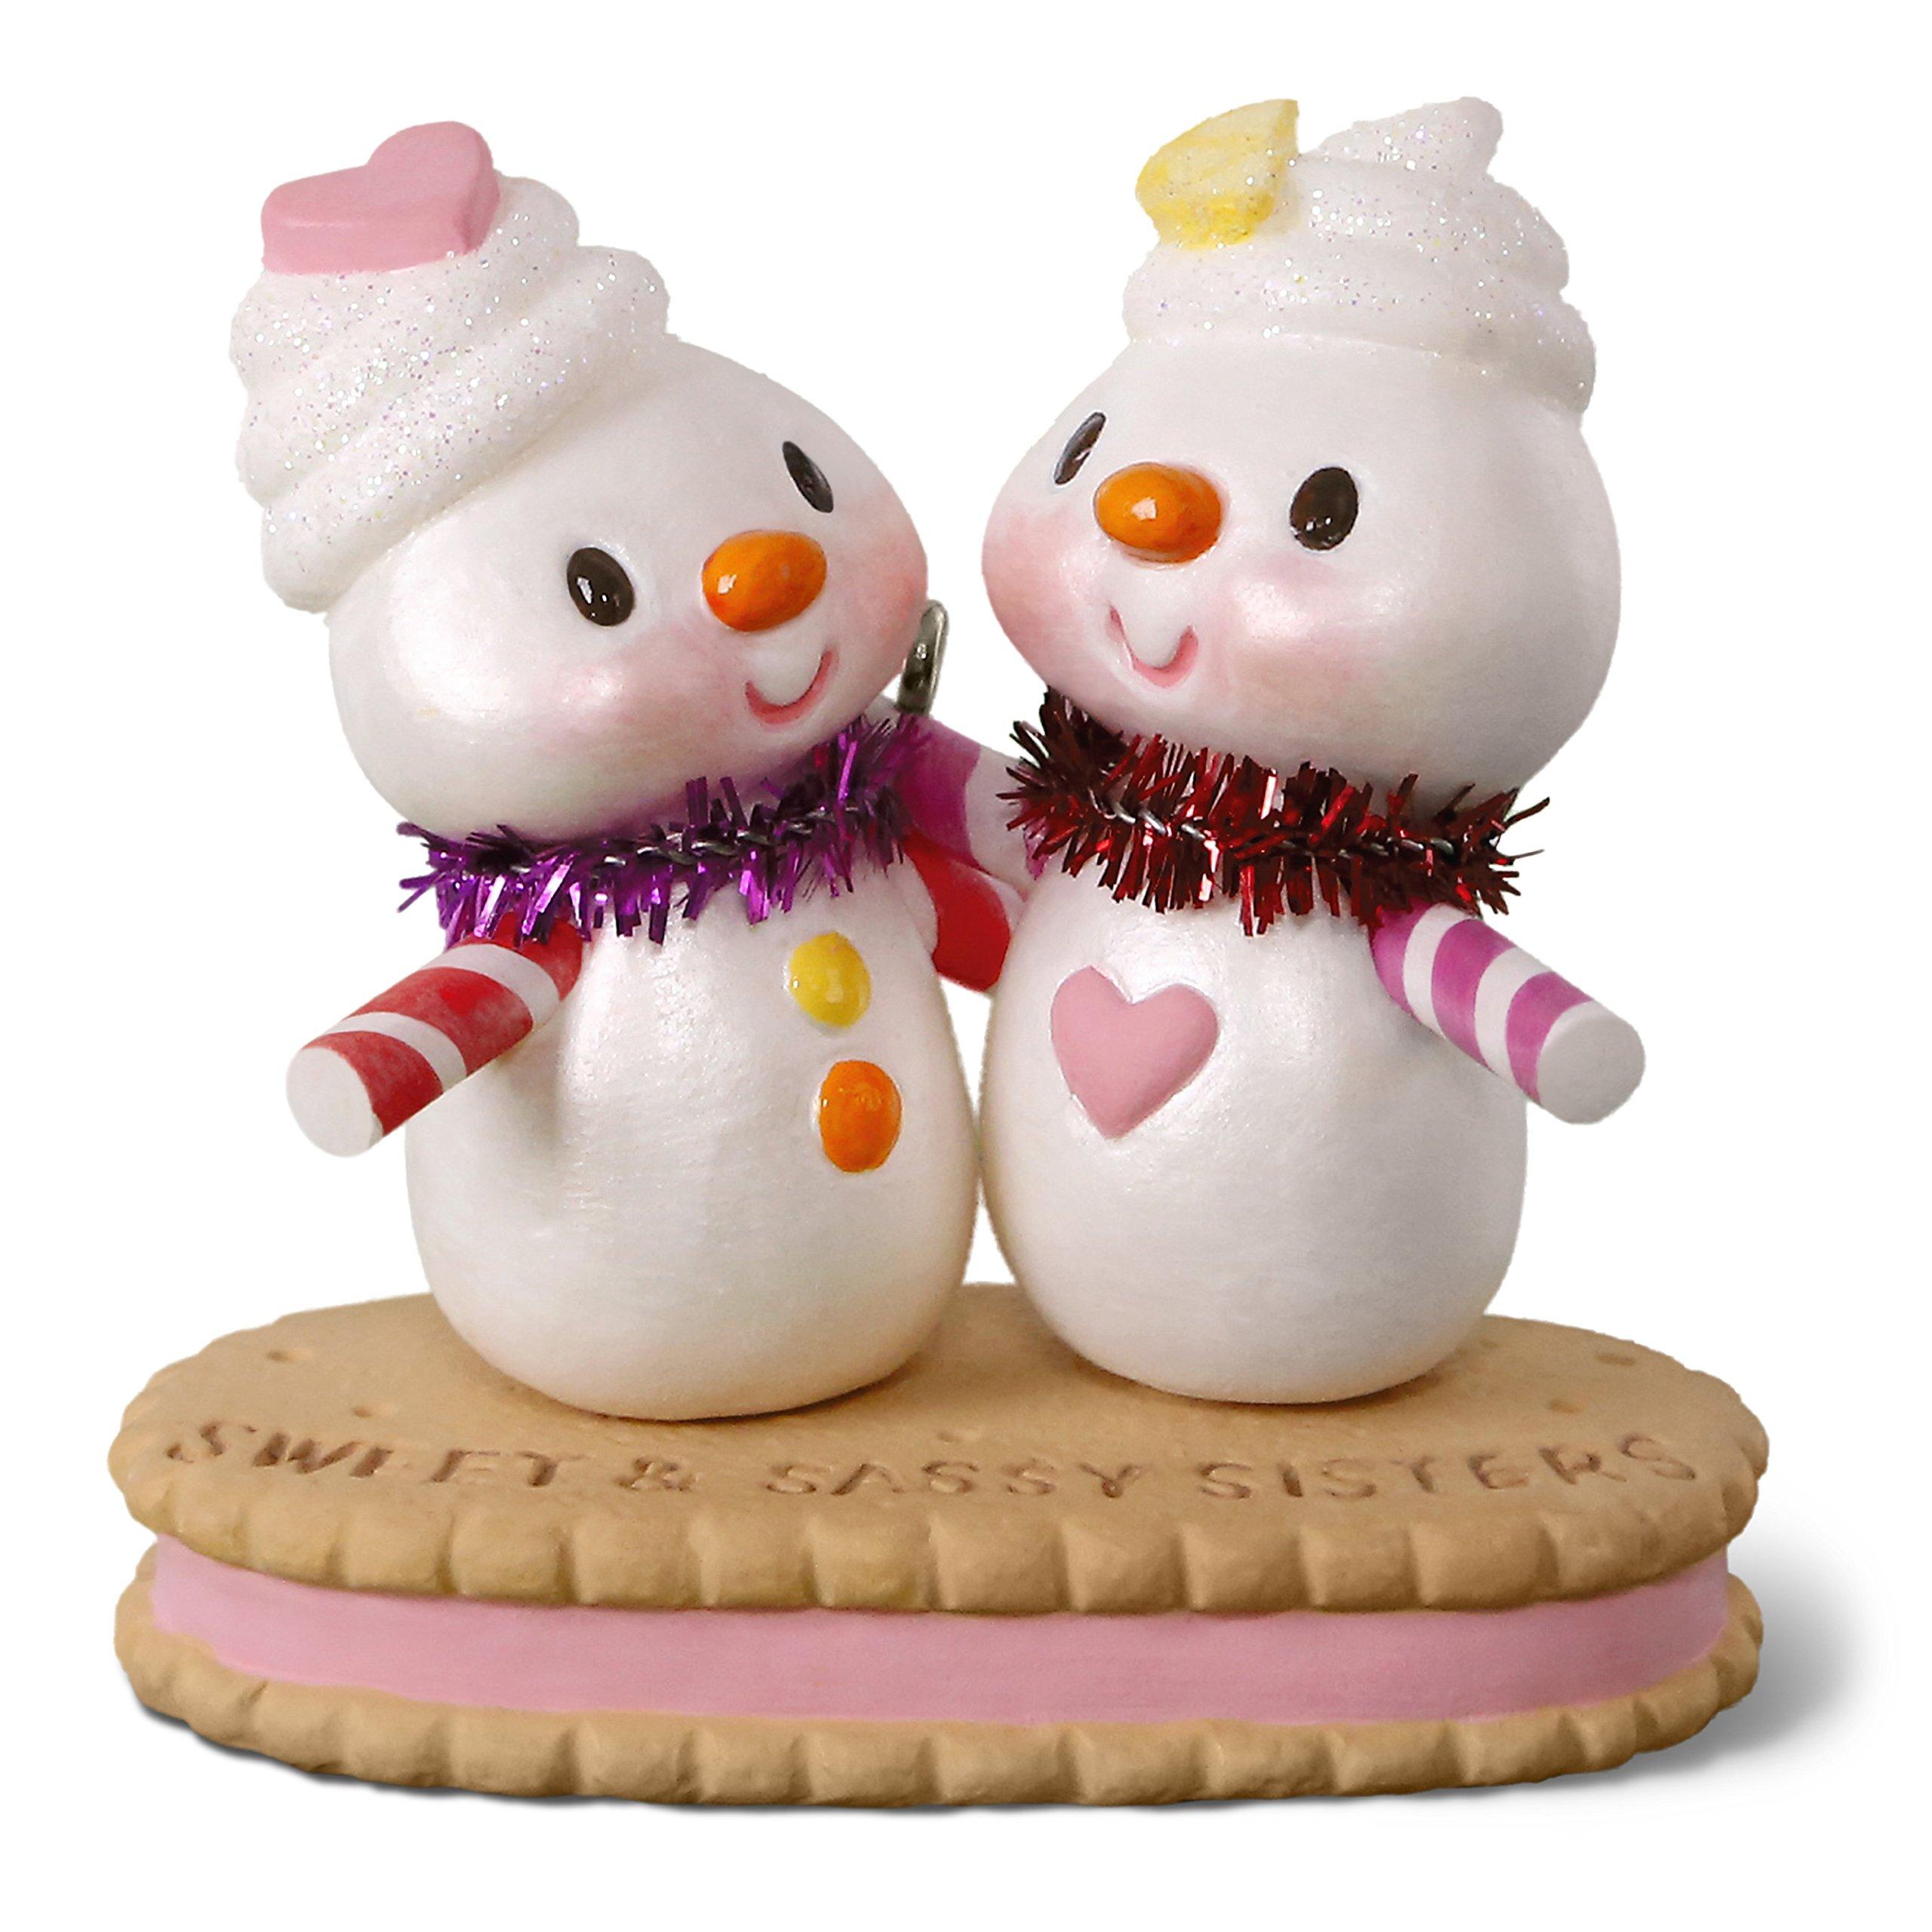 Hallmark Keepsake Christmas Ornament 2018 Year Dated: Amazon.com: Close-Knit Sisters 2011 Hallmark Ornament